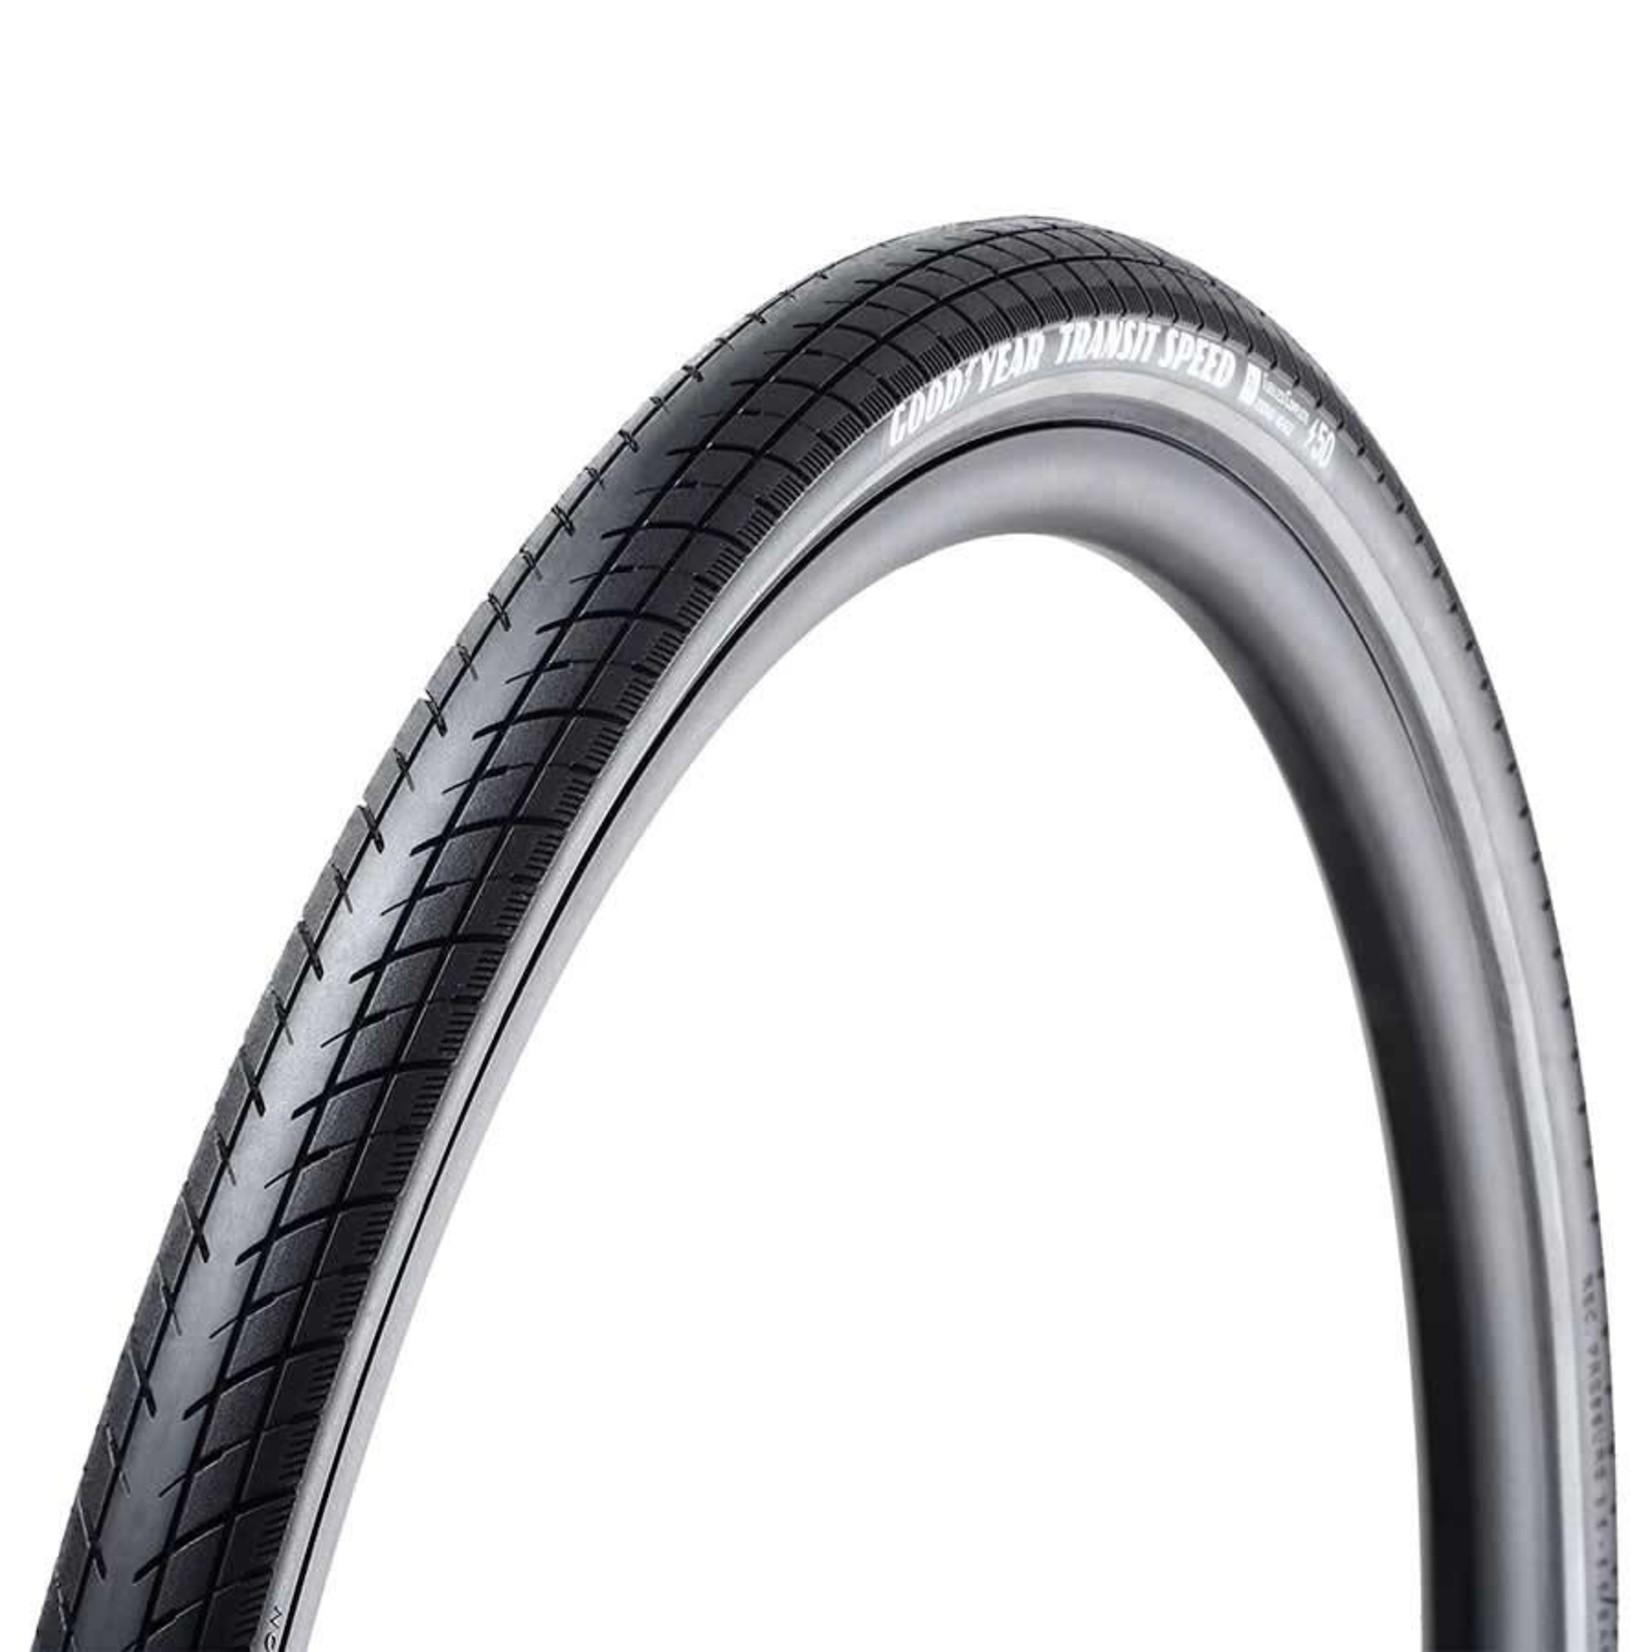 Goodyear Transit Speed, Tire, 700x50C, Folding, Tubeless Ready, Dynamic:Silica4, R:Armor, 60TPI, Black